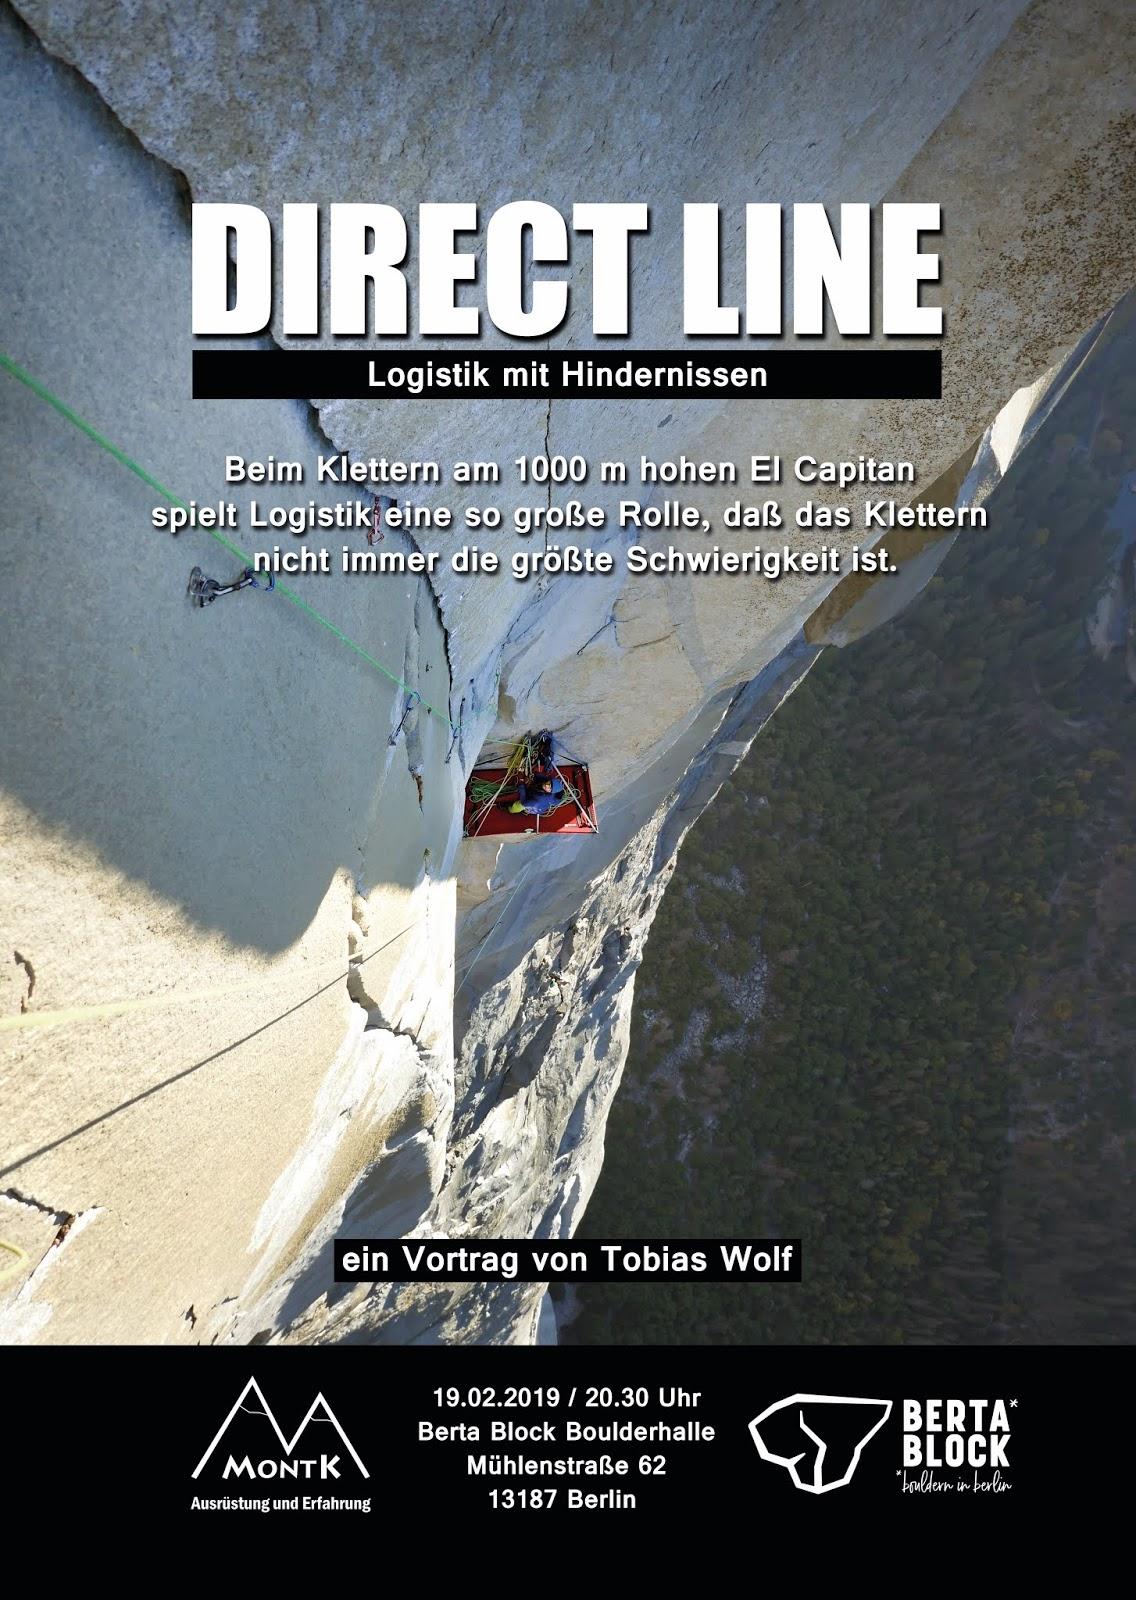 Sandsteinleidenschaft Vortrag Direct Line El Capitan